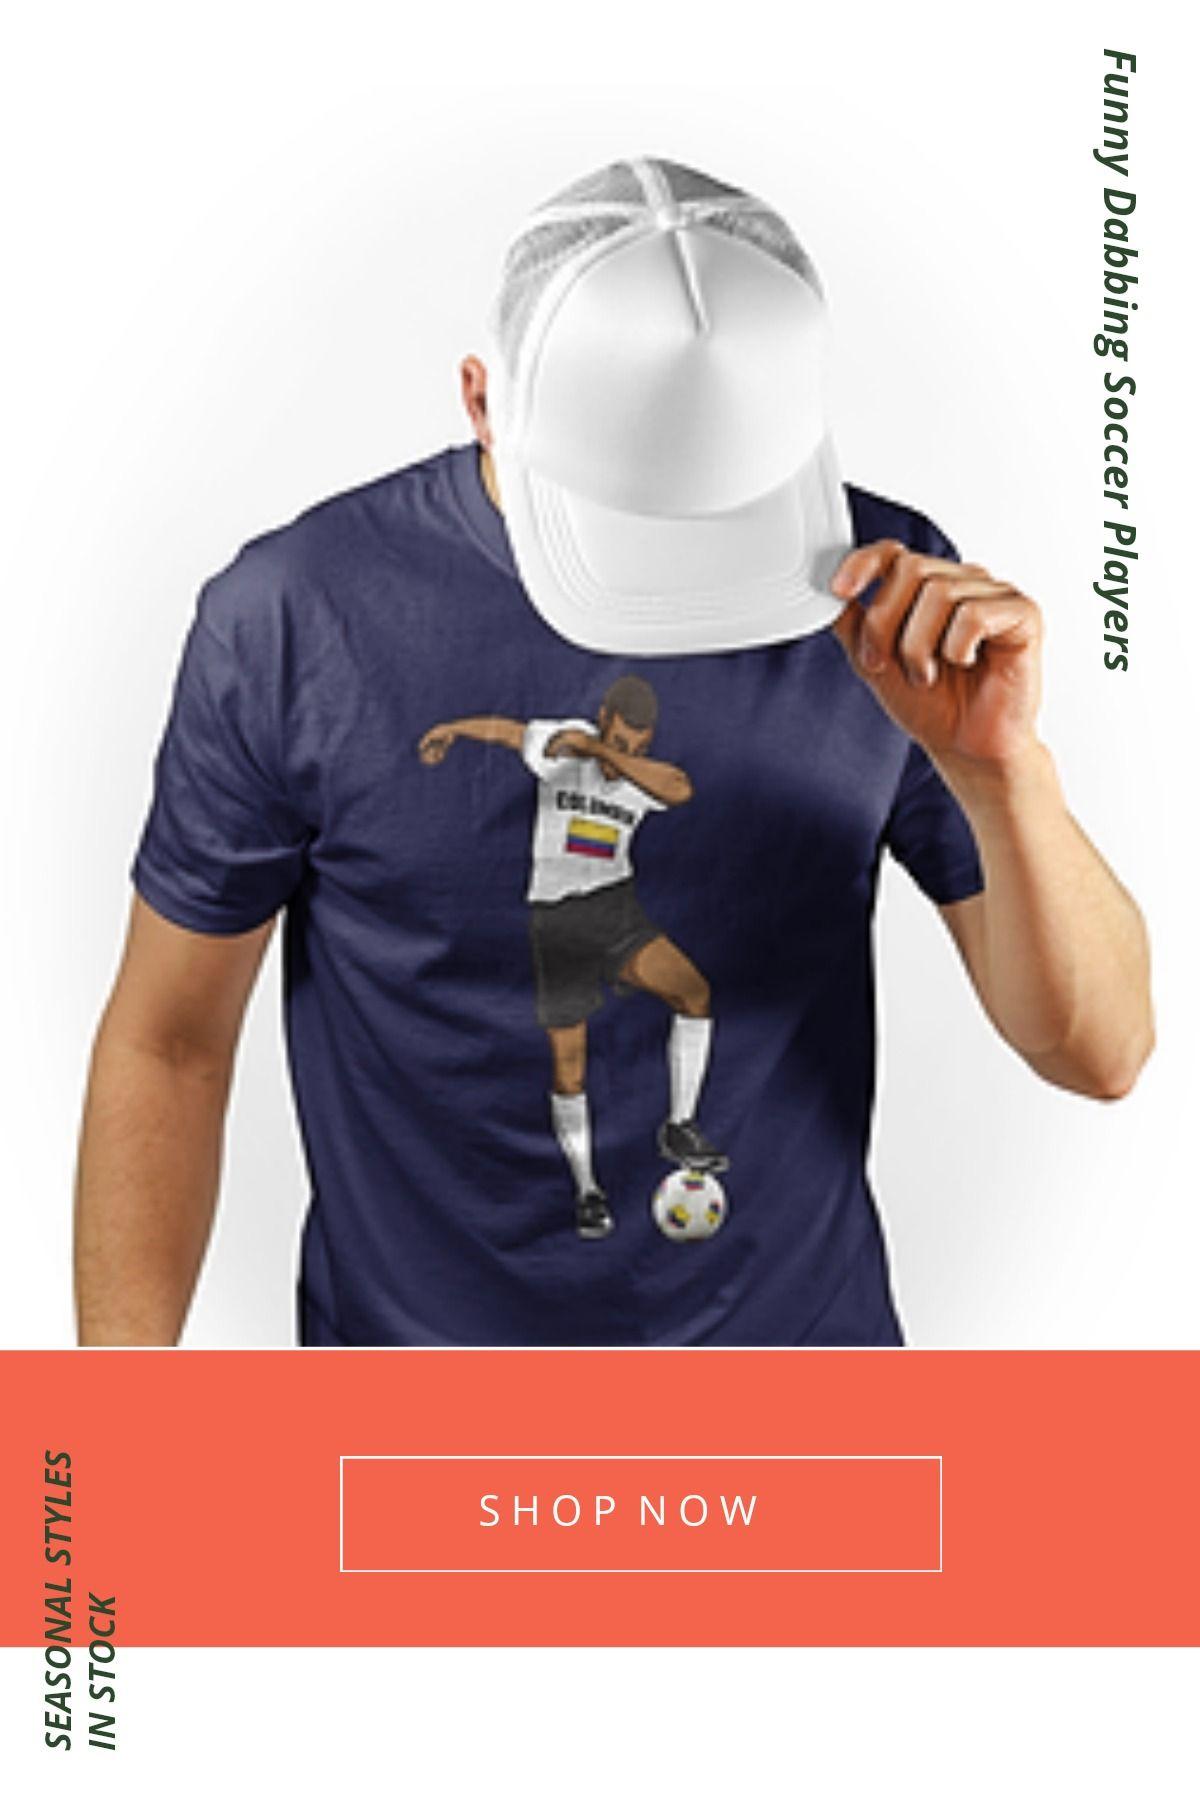 e95ac7c6f Funny Dabbing Soccer Players Kids Colombia Soccer T Shirt - Dabbing Player  Fan Boys  Soccer  Football  Sports  Futbol  Worldcup  Russia  Russia2018 ...